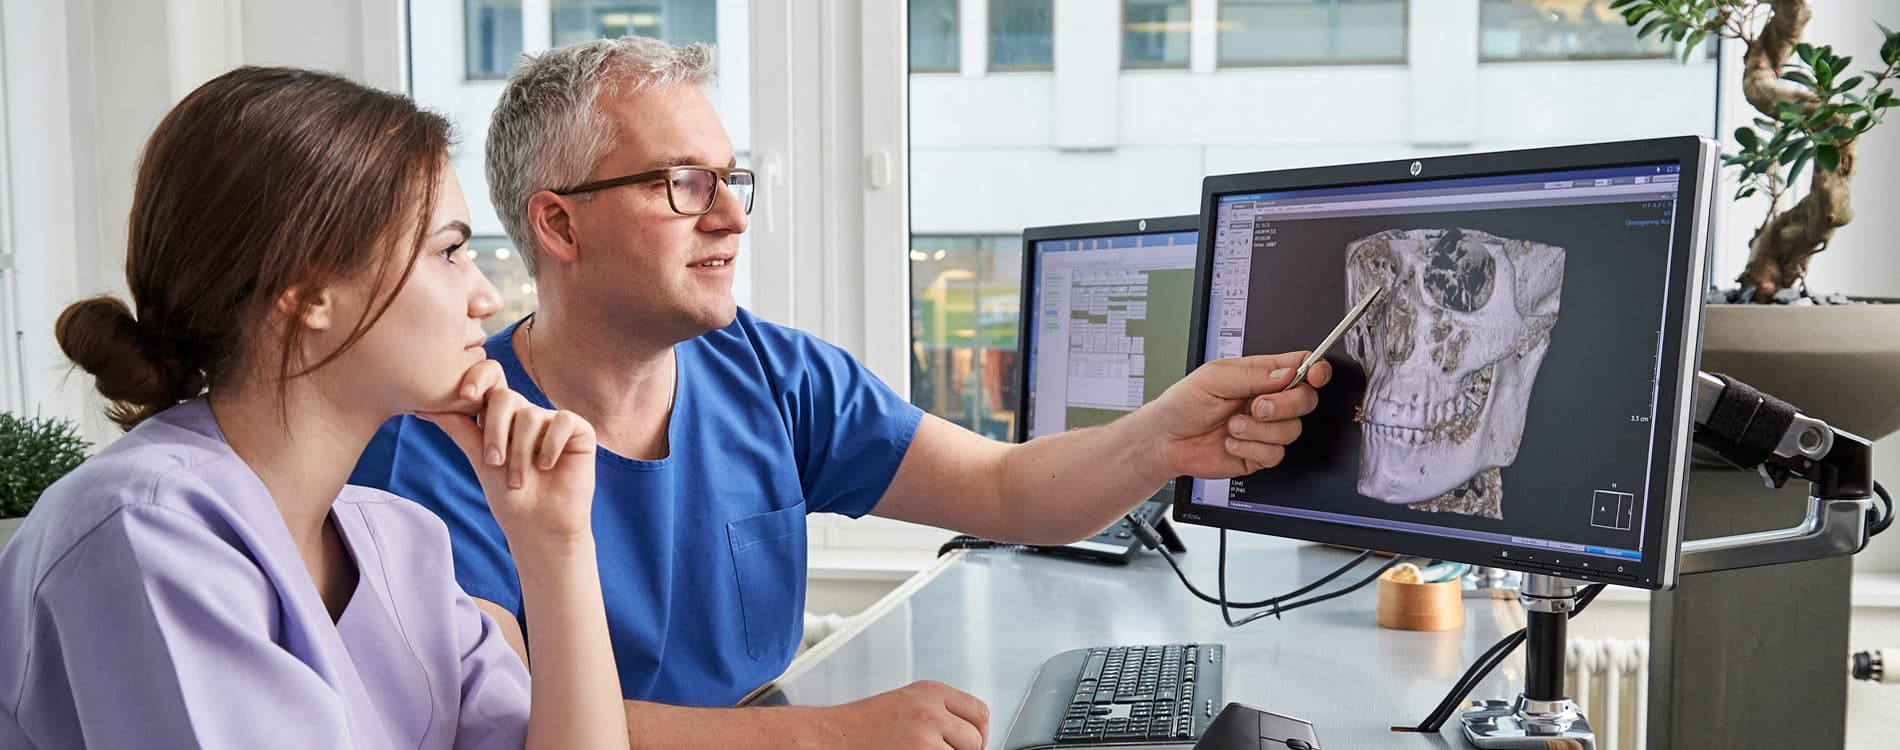 Dr Heinz Theo Lübbers 3D Radiologie